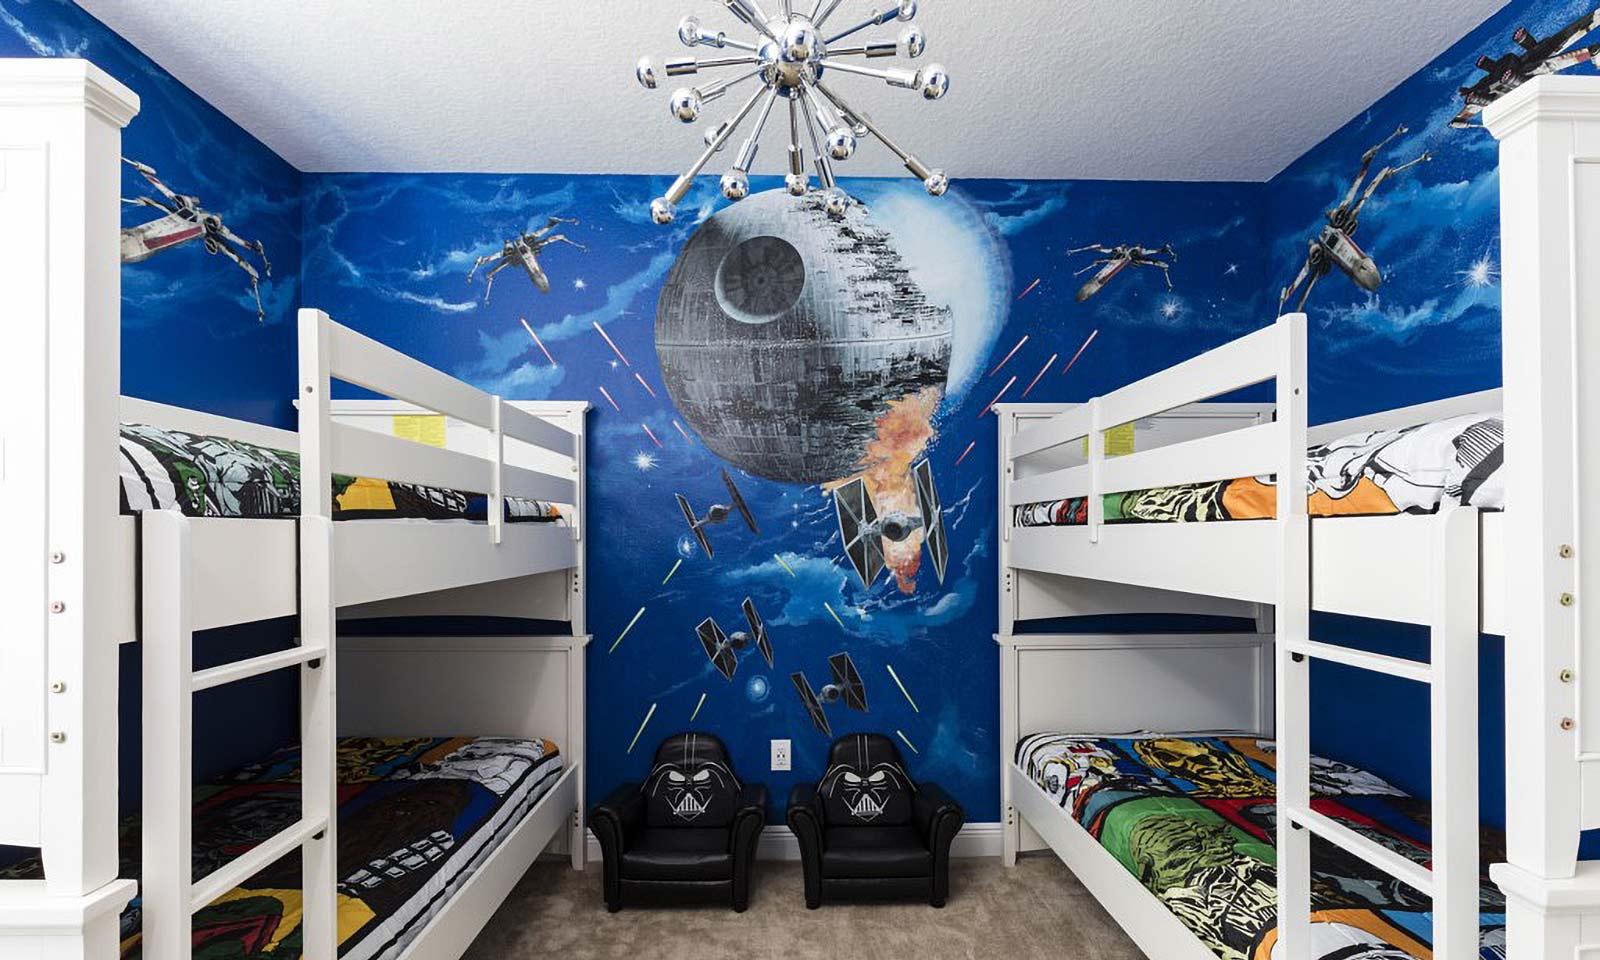 [amenities:themed-bedroom:3] Themed Bedroom